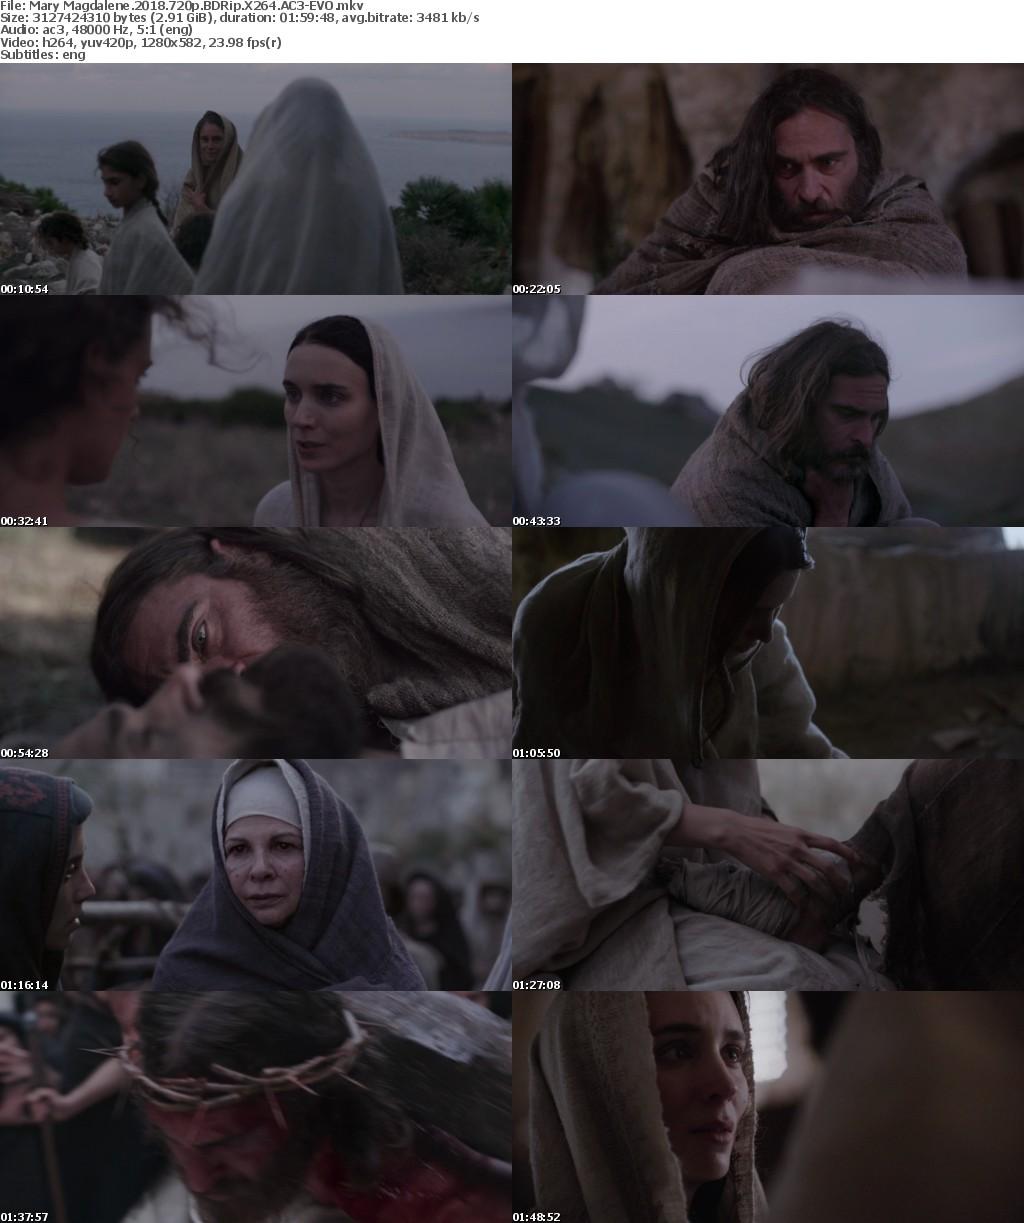 Mary Magdalene (2018) 720p BDRip X264 AC3-EVO